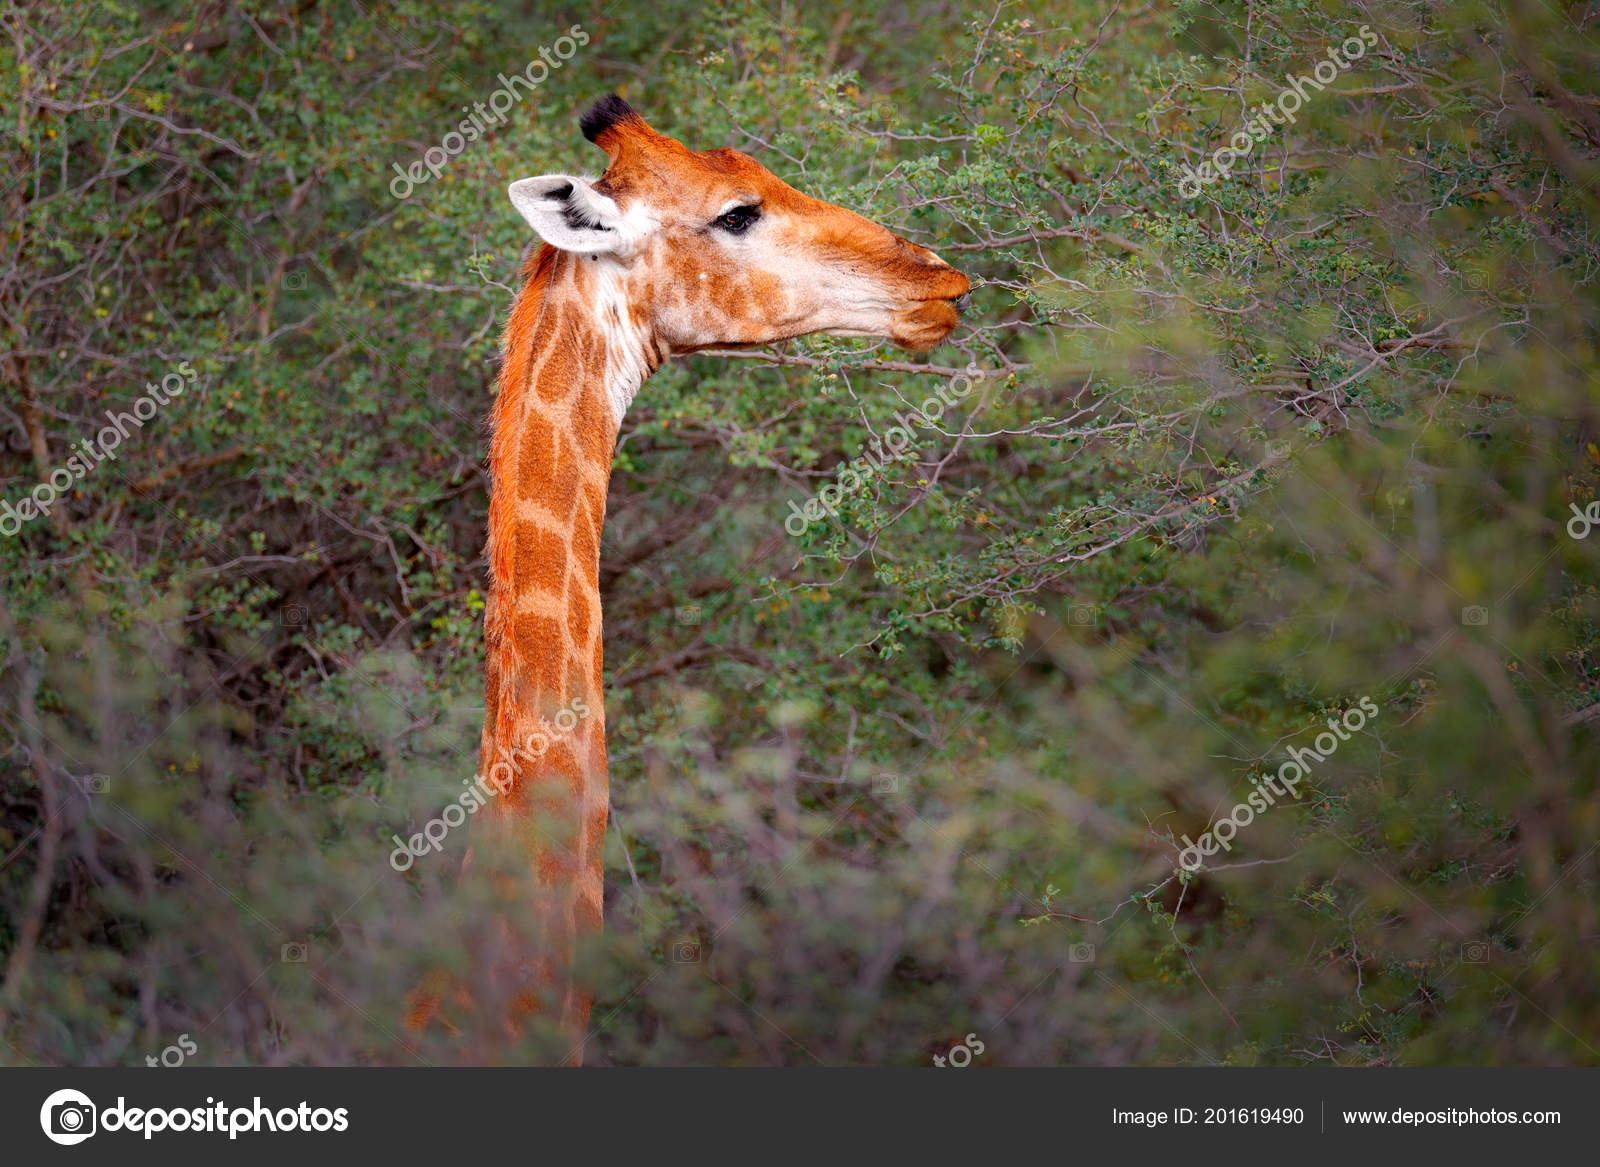 Portrait Giraffe Hidden Green Trees Forest Vegetation Big Animal